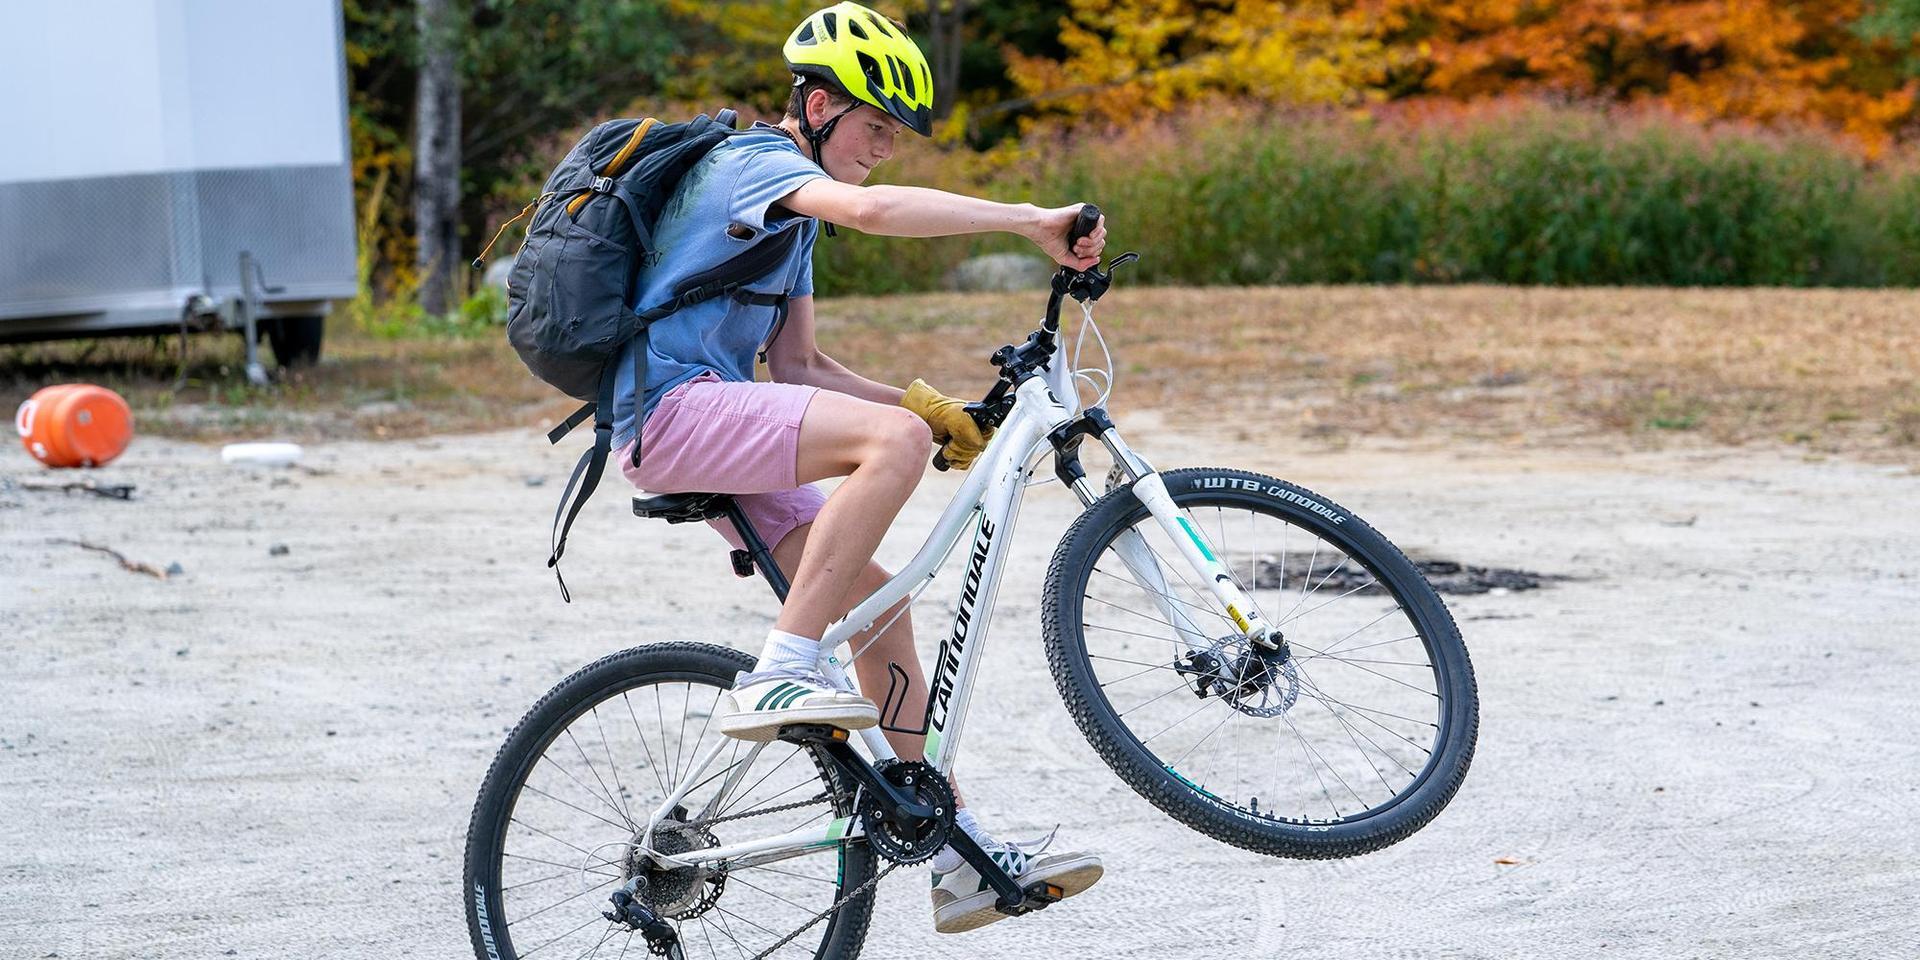 A student pops a wheelie on their mountain bike.